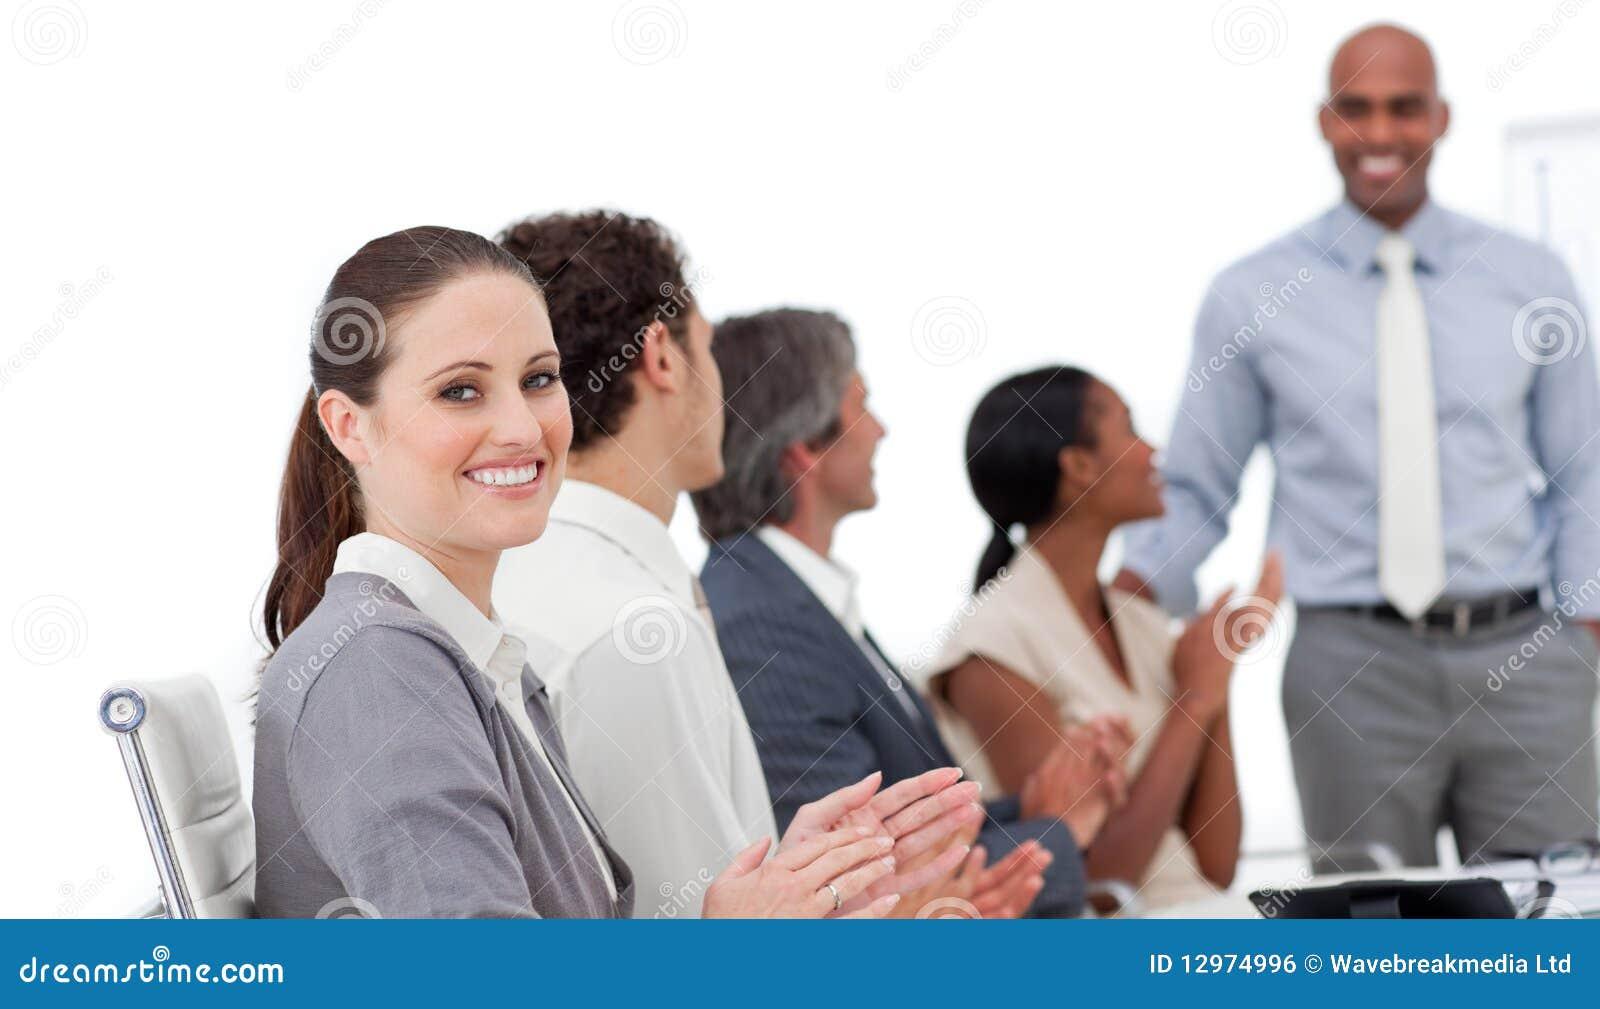 good business presentation